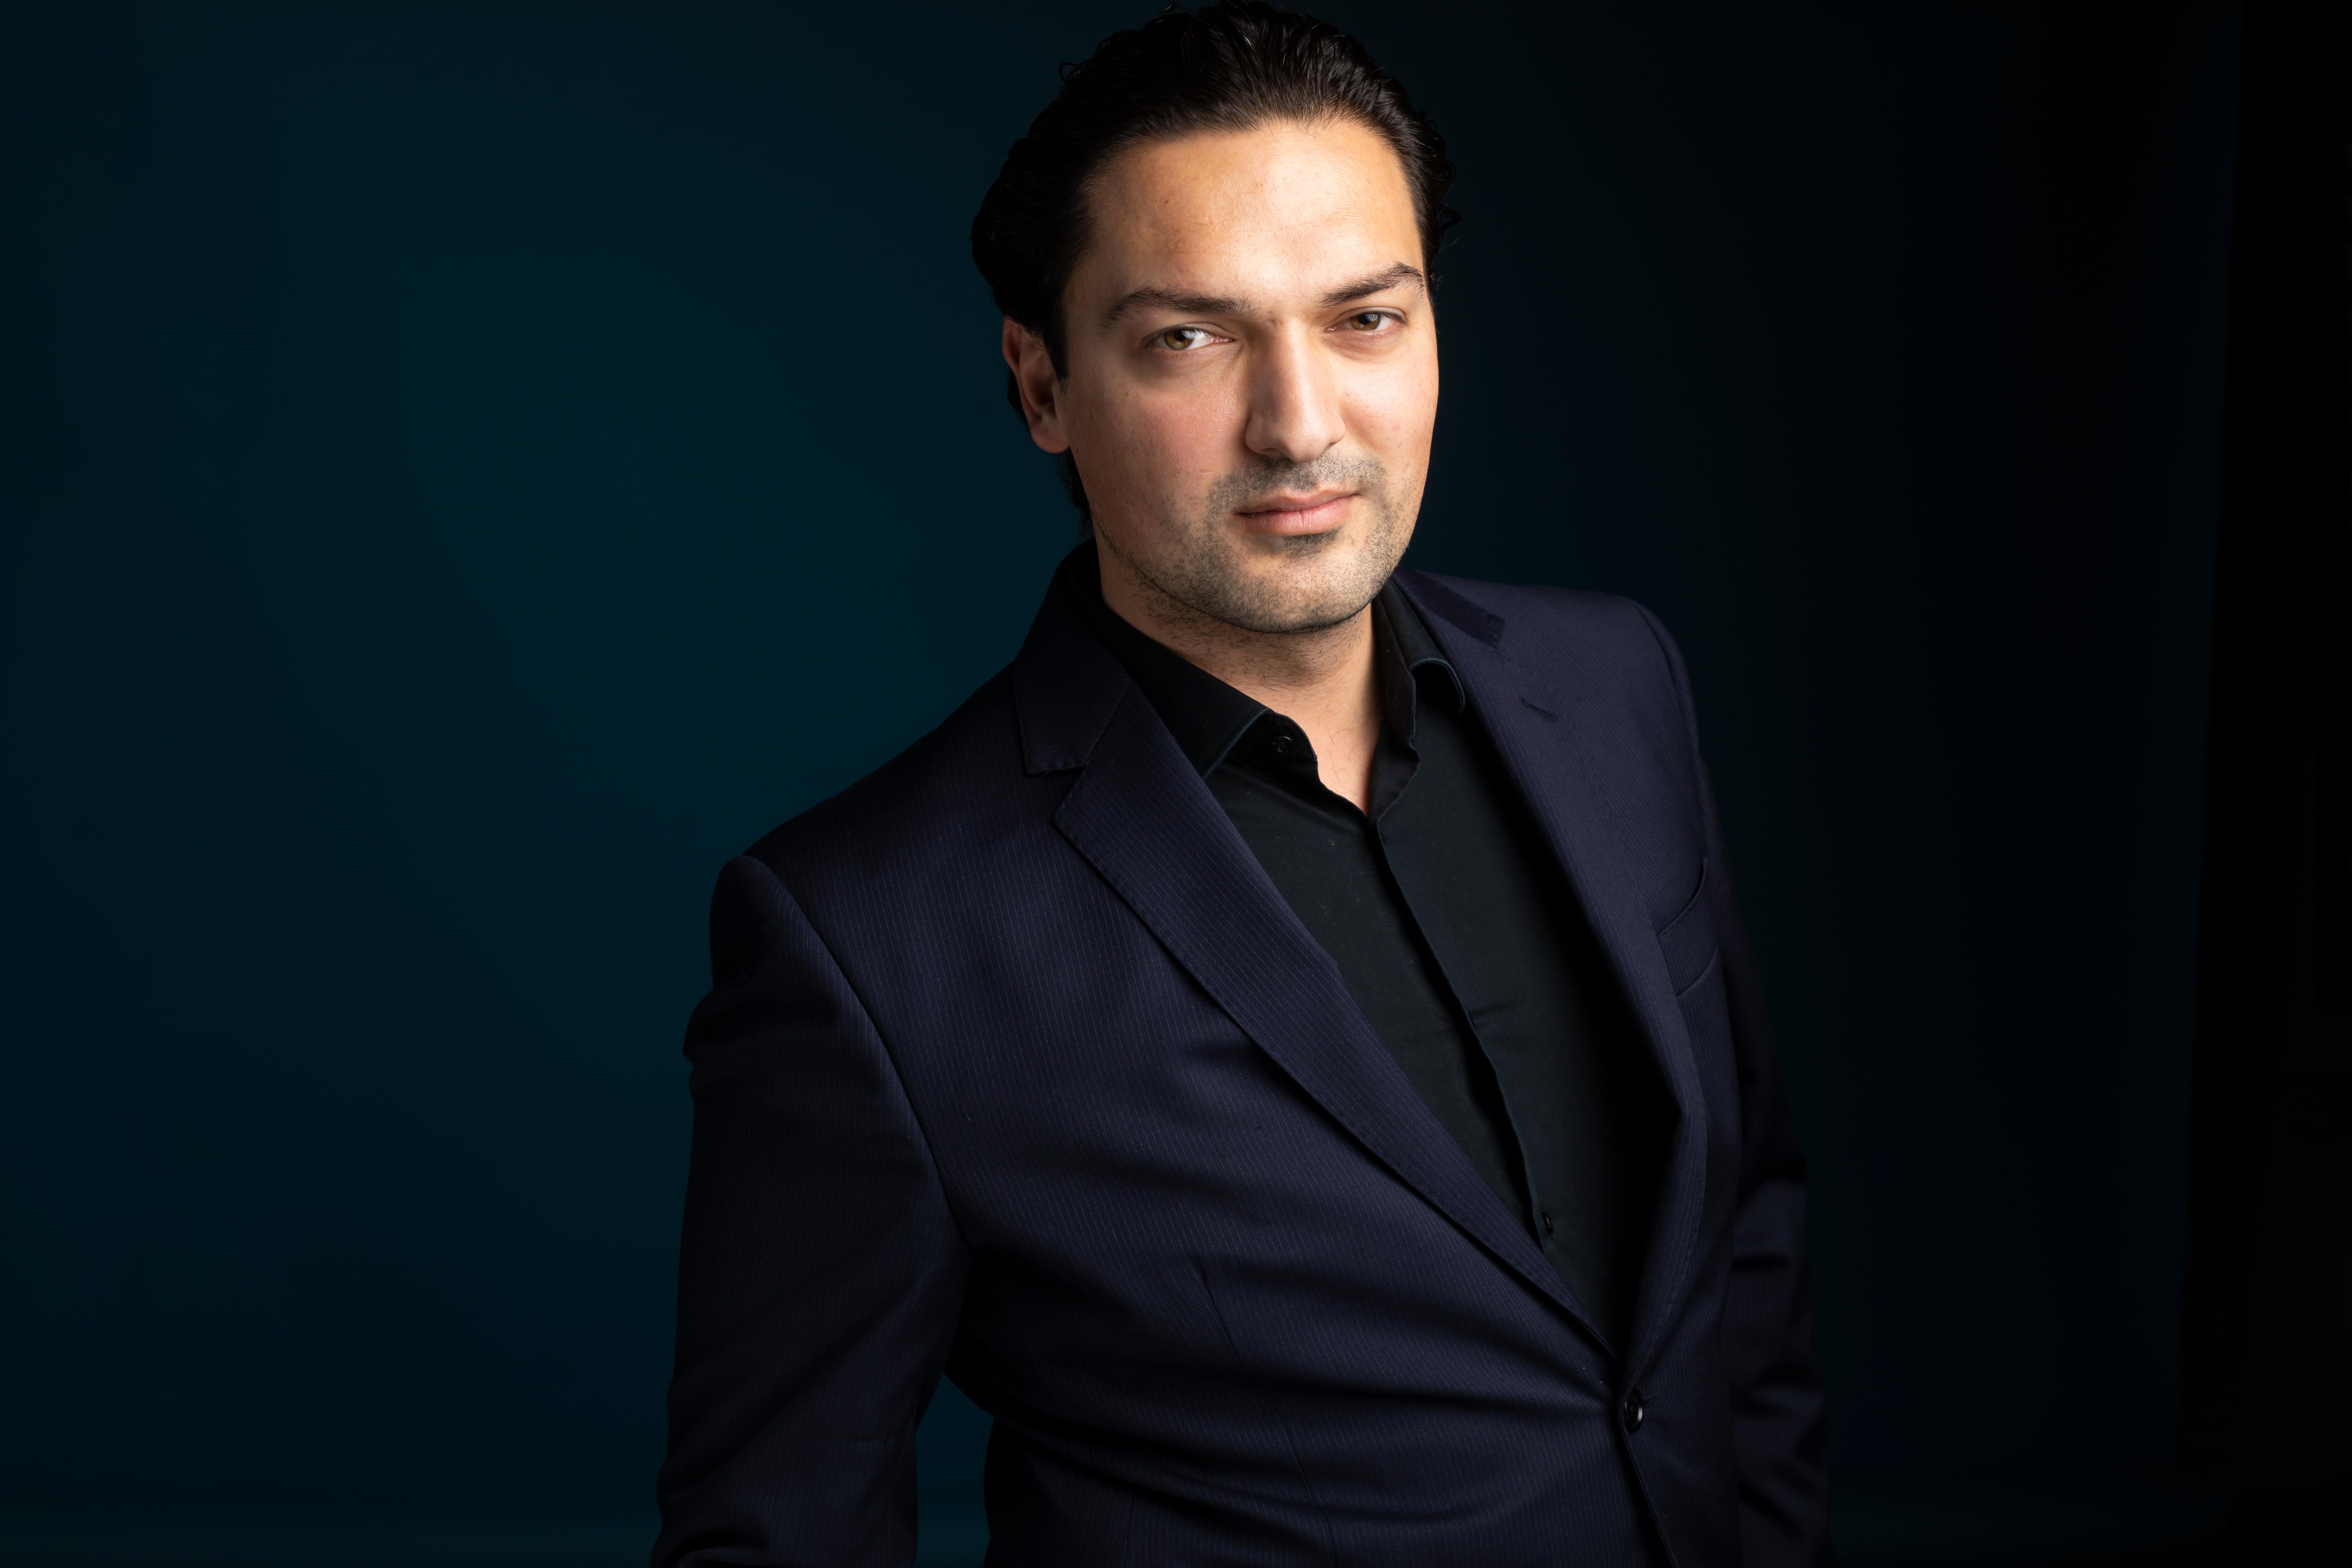 Andre Tehrani